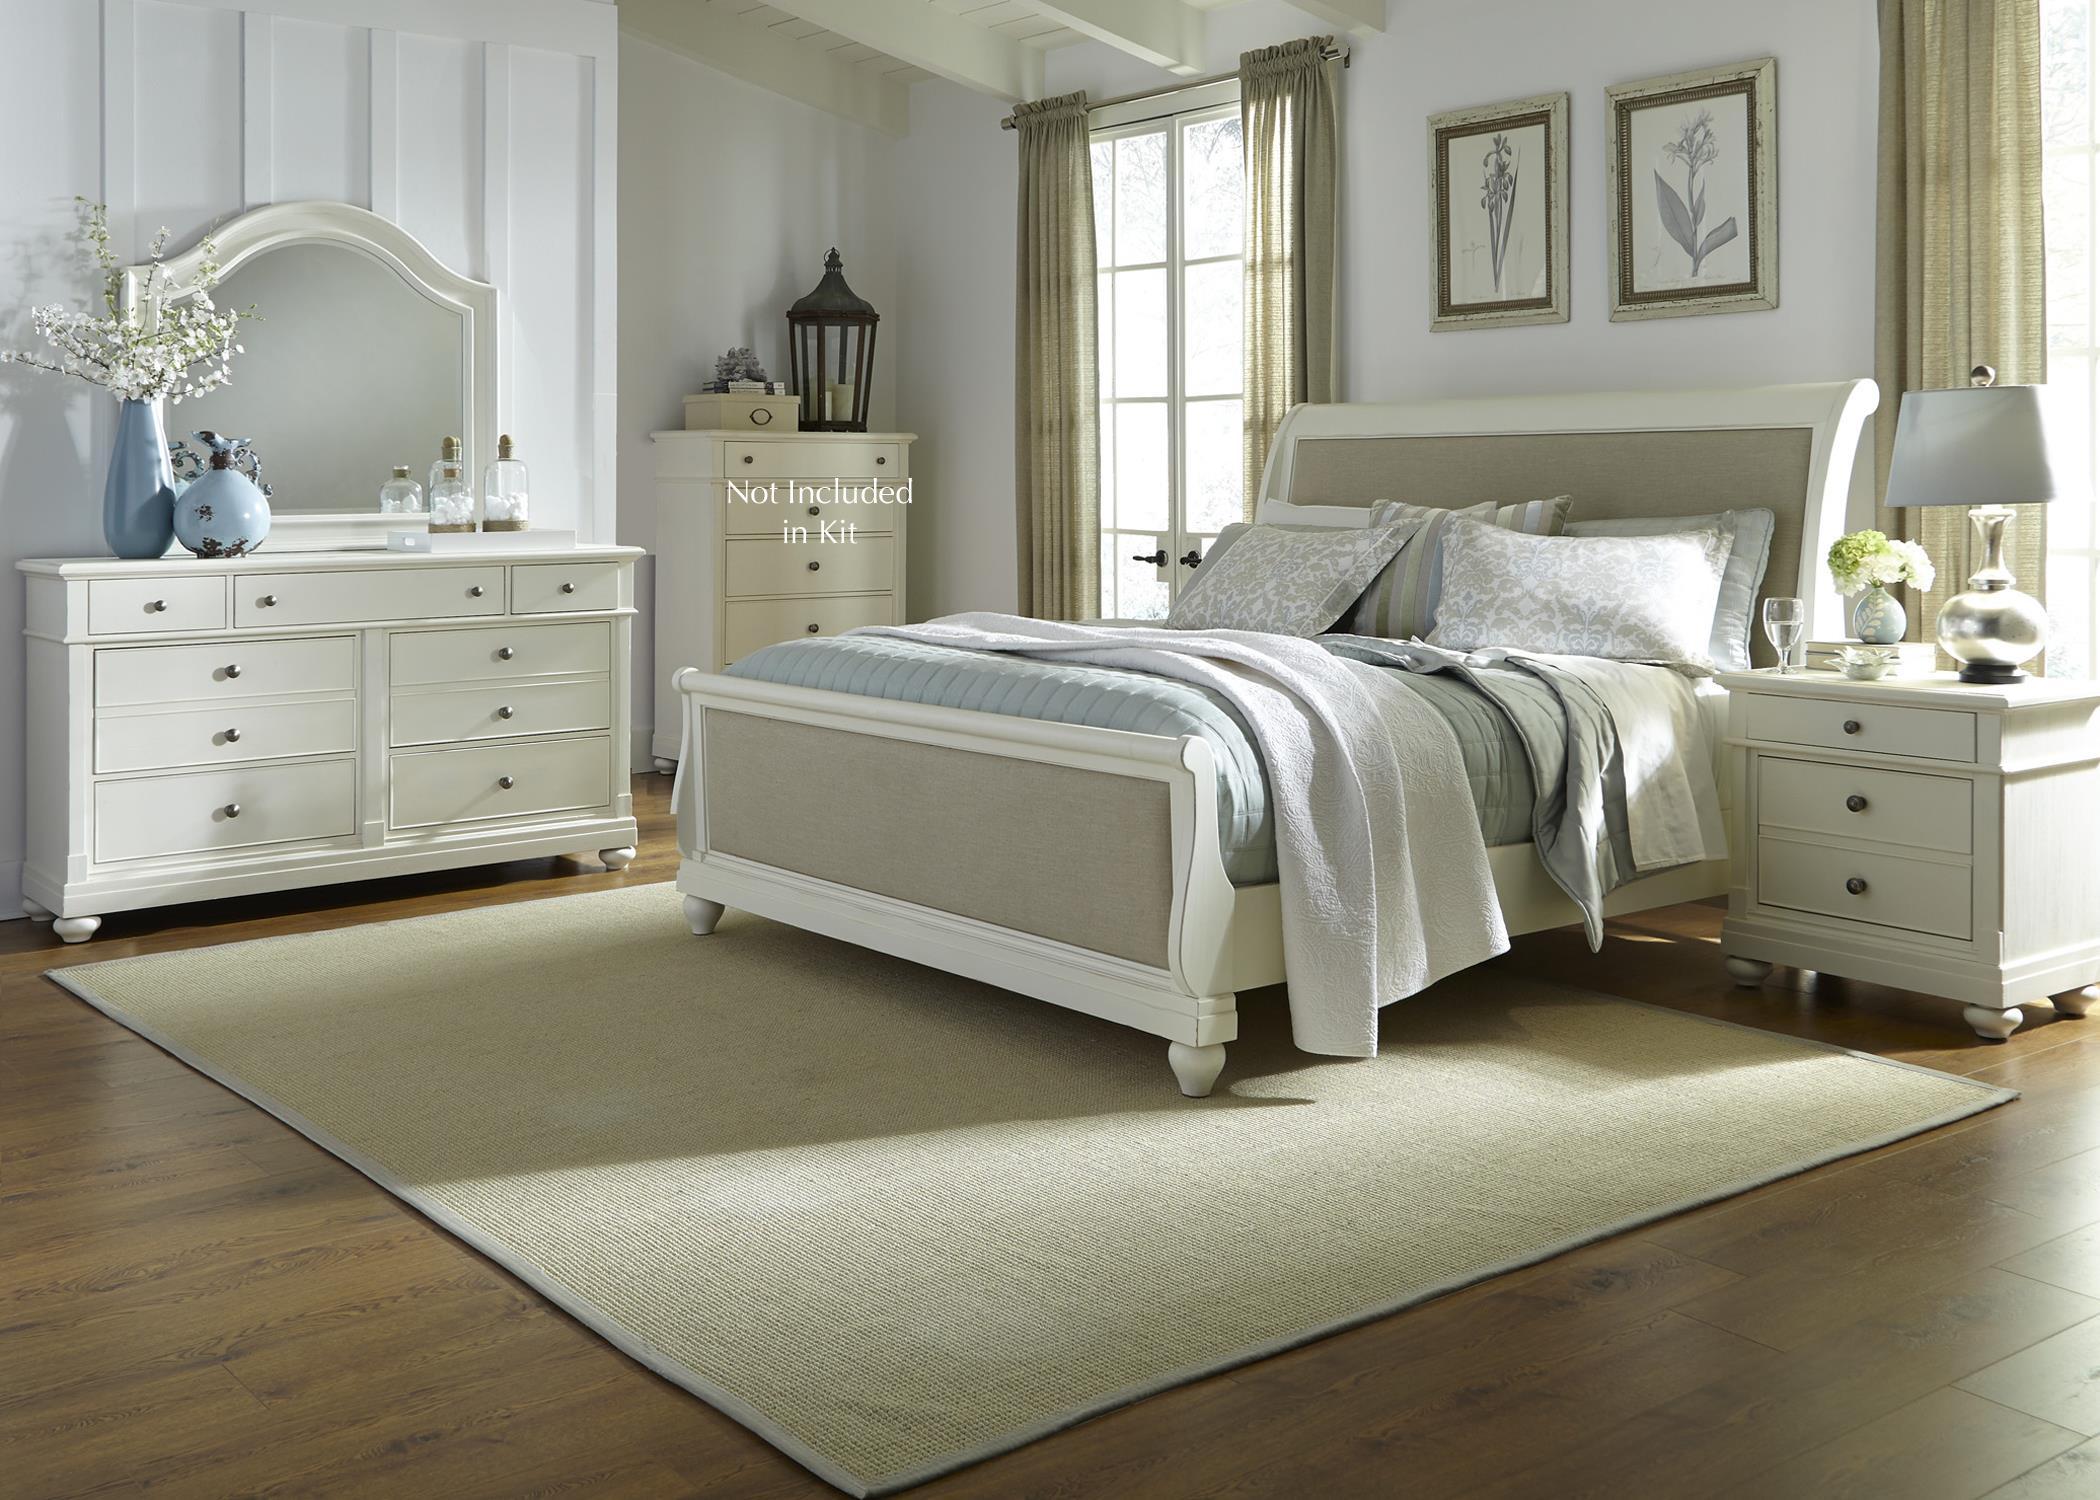 Liberty Furniture Harbor View Queen Bedroom Group - Item Number: 631-BR-QSLDMN